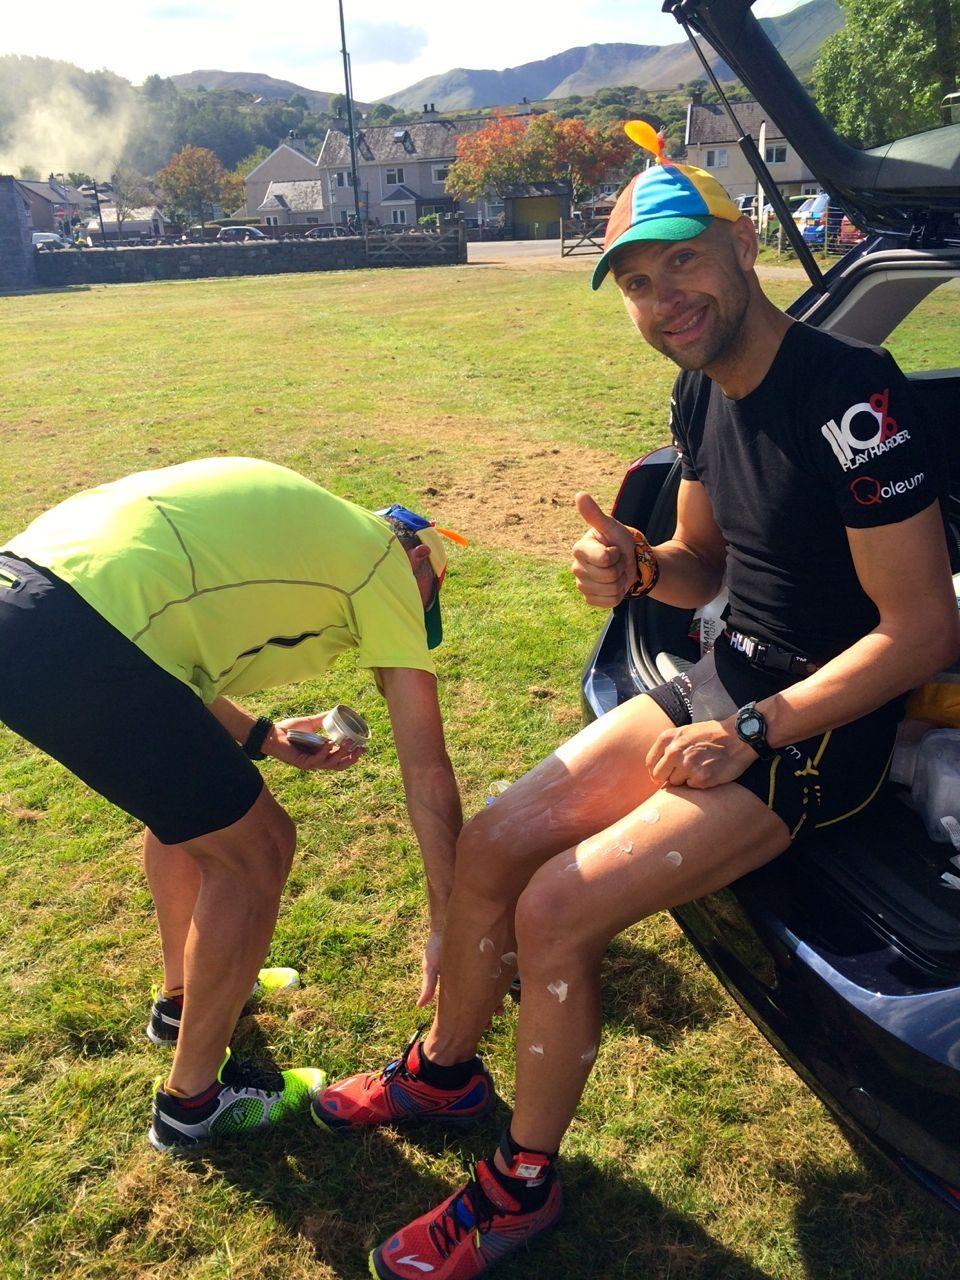 Luke Tyburski gets a rub-down during the Double Brutal Extreme Triathlon